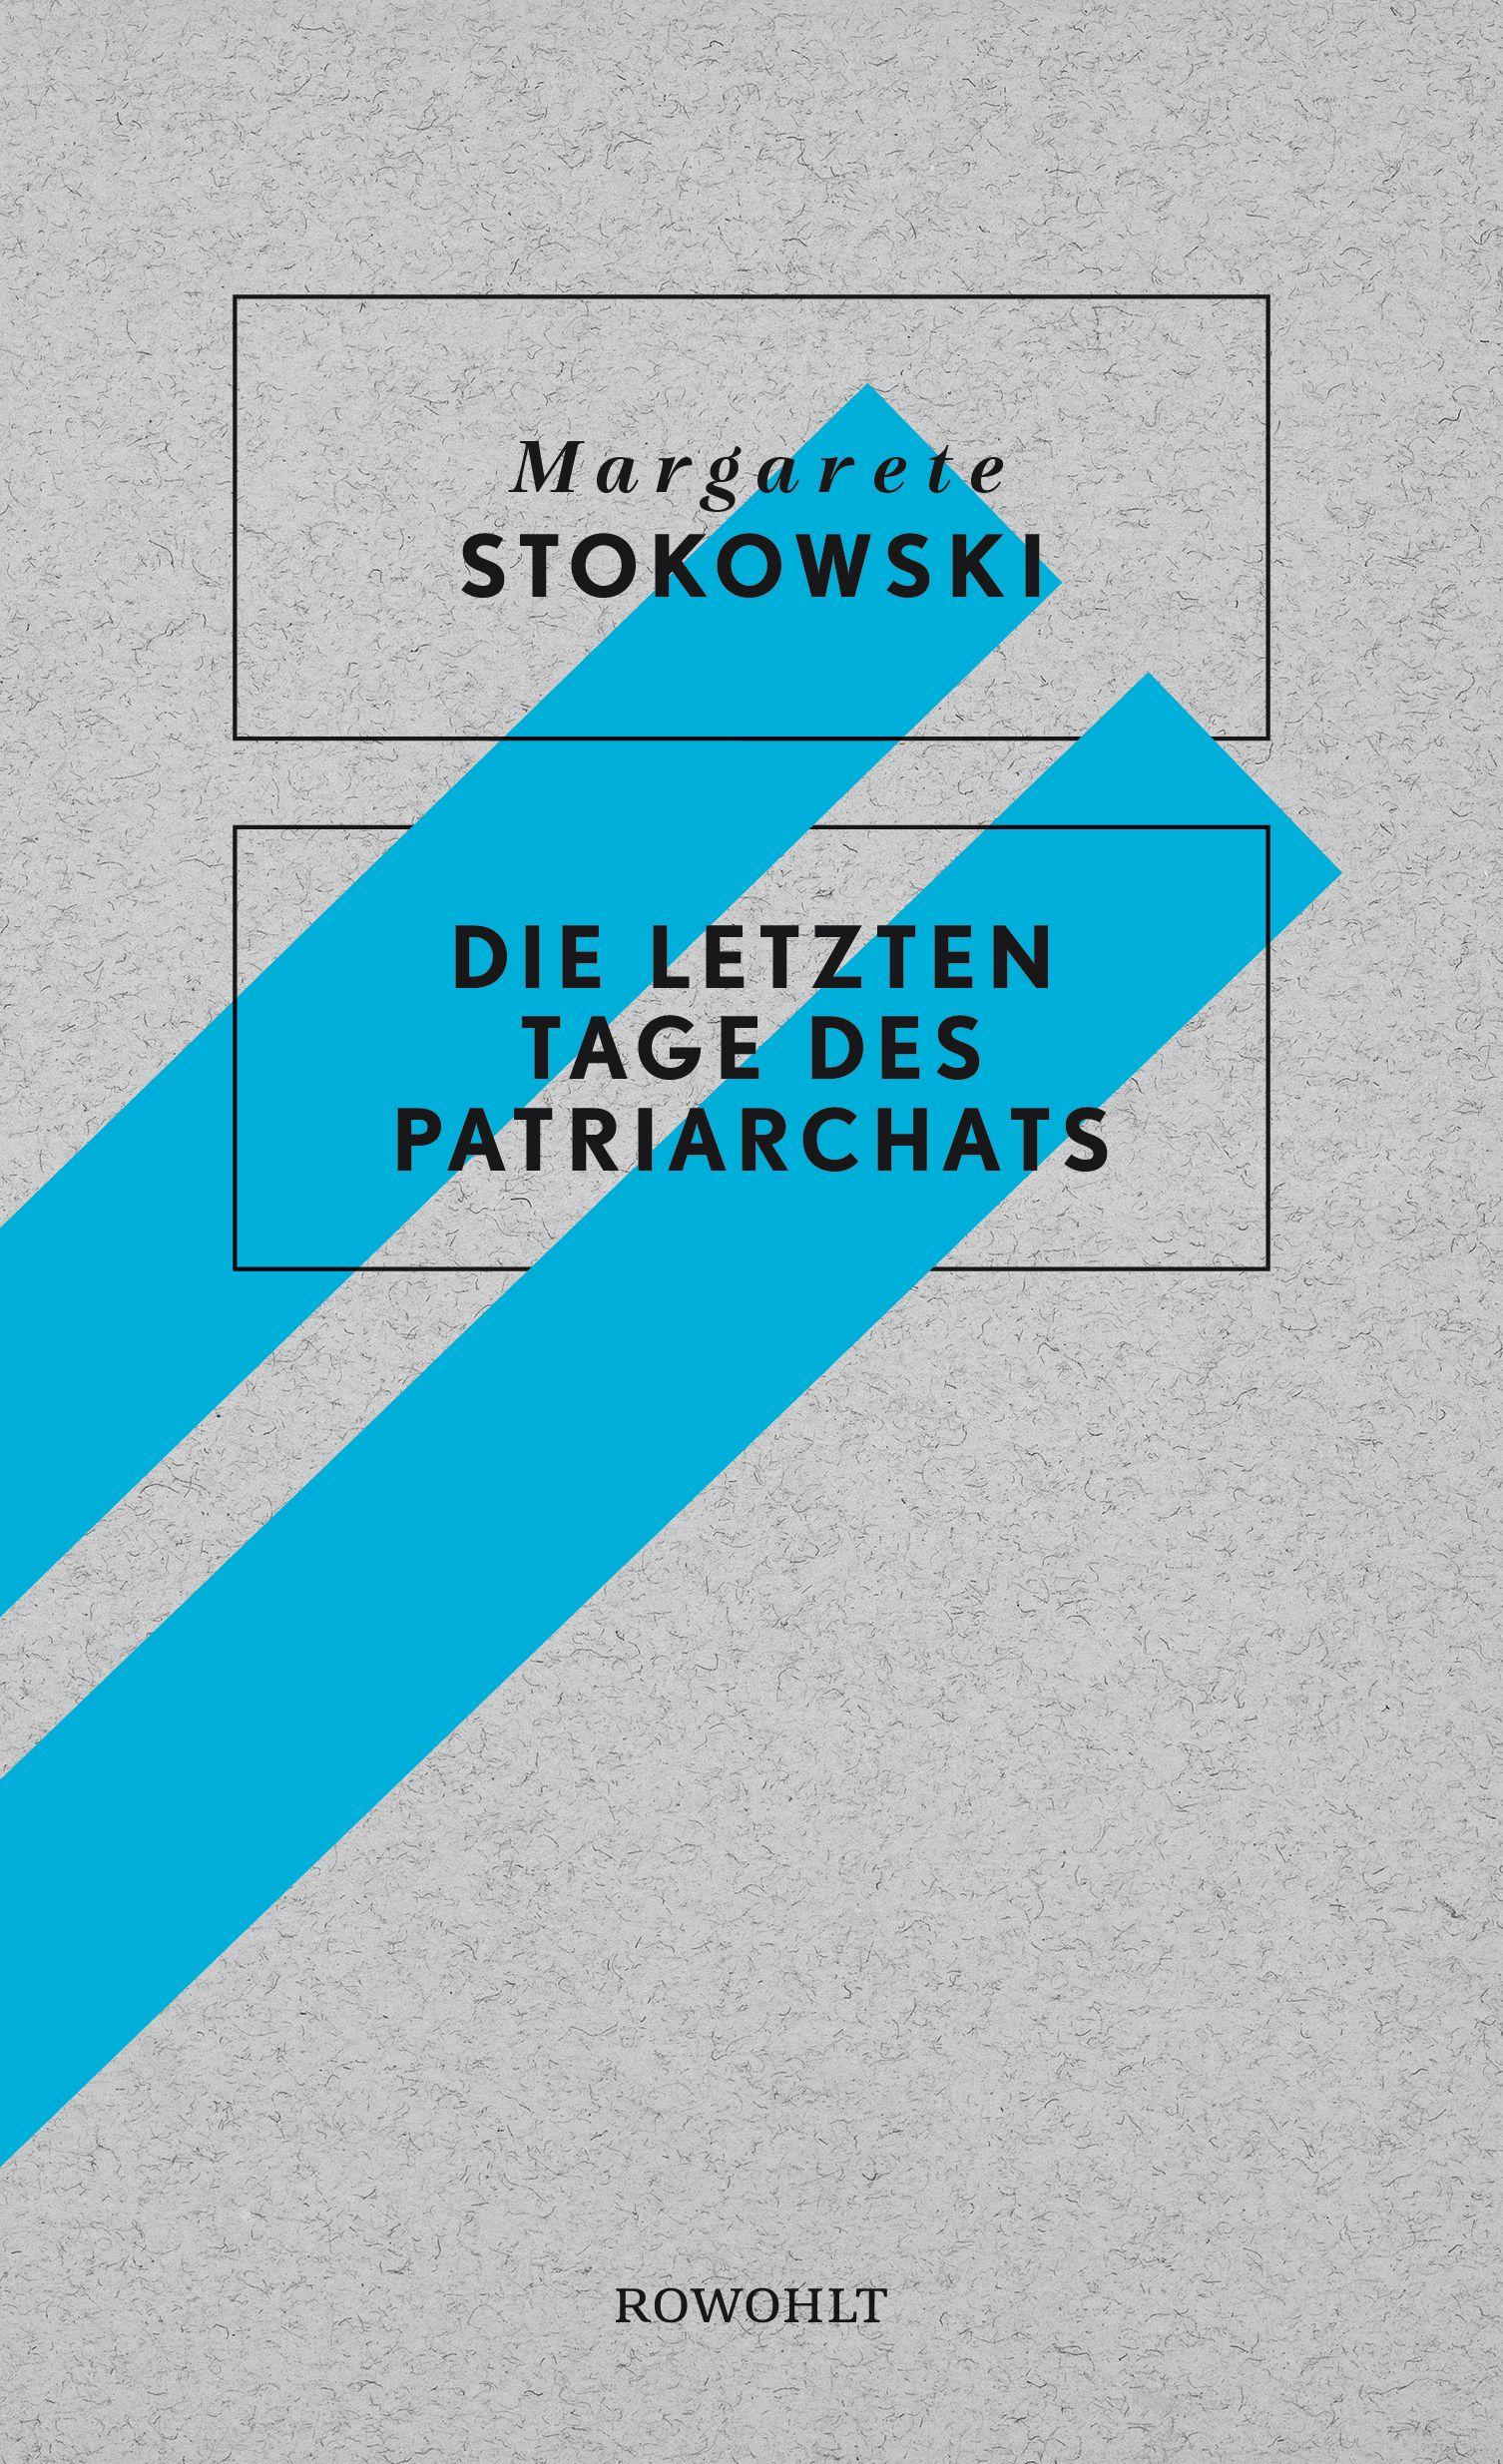 Cover_Stokowski_Die letzten Tage des Patriarchats